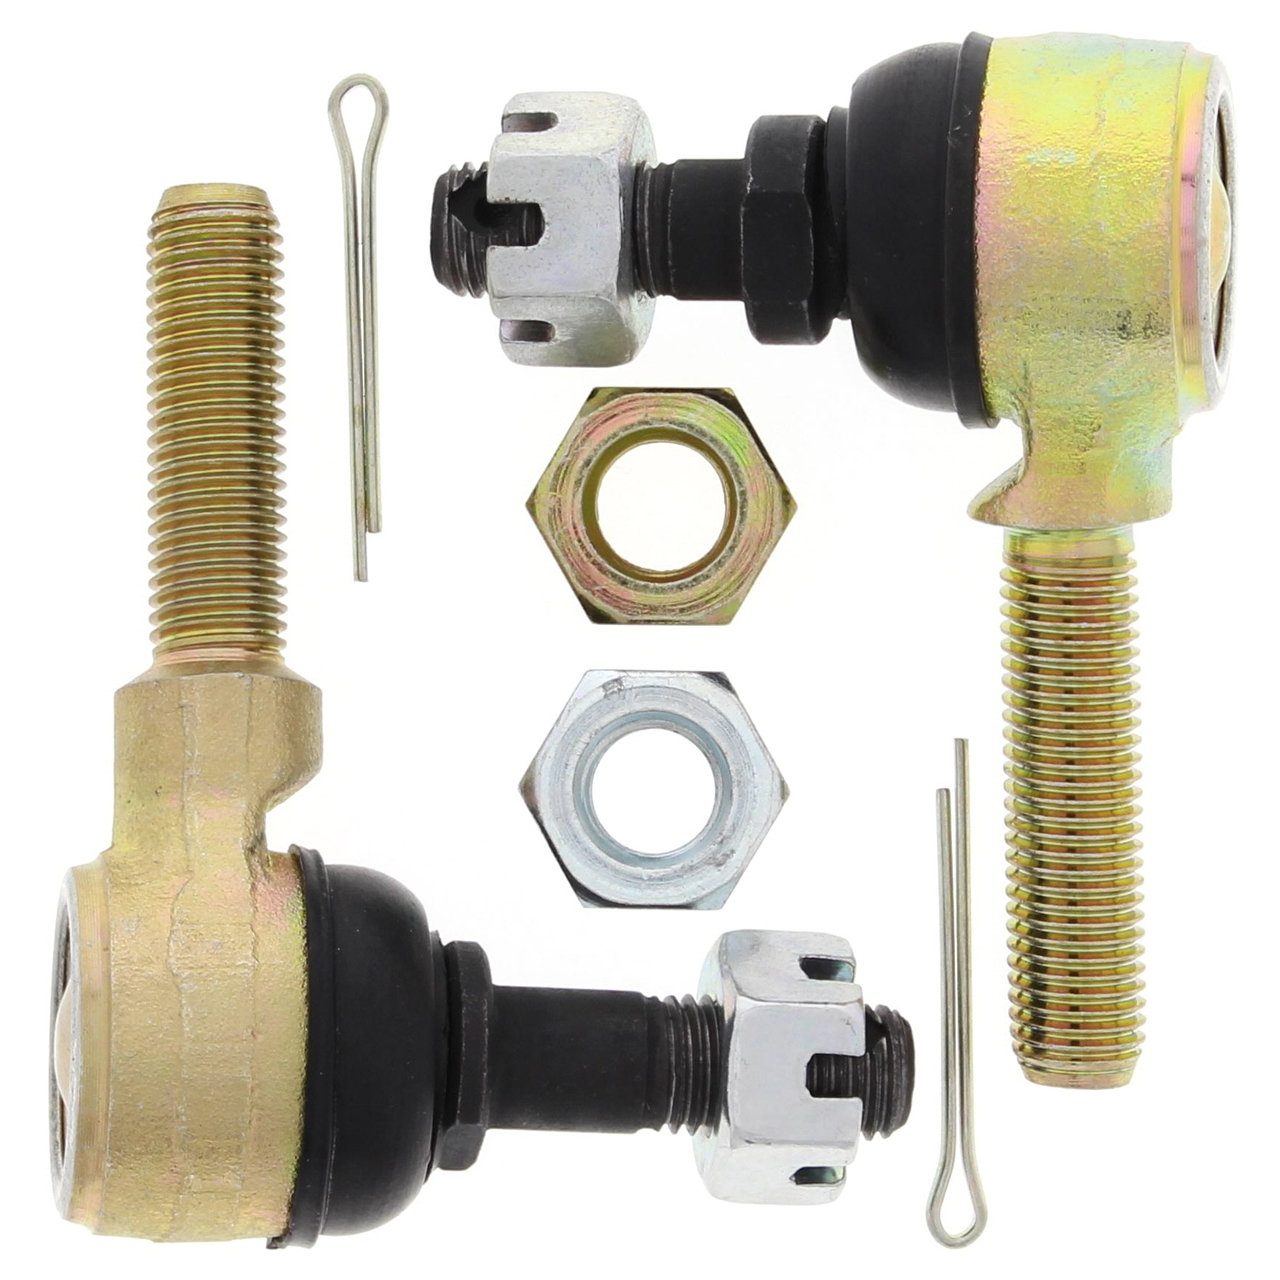 new tie rod end kit kymco mxu 375 375cc 2009 2010 2036 0 - Denparts